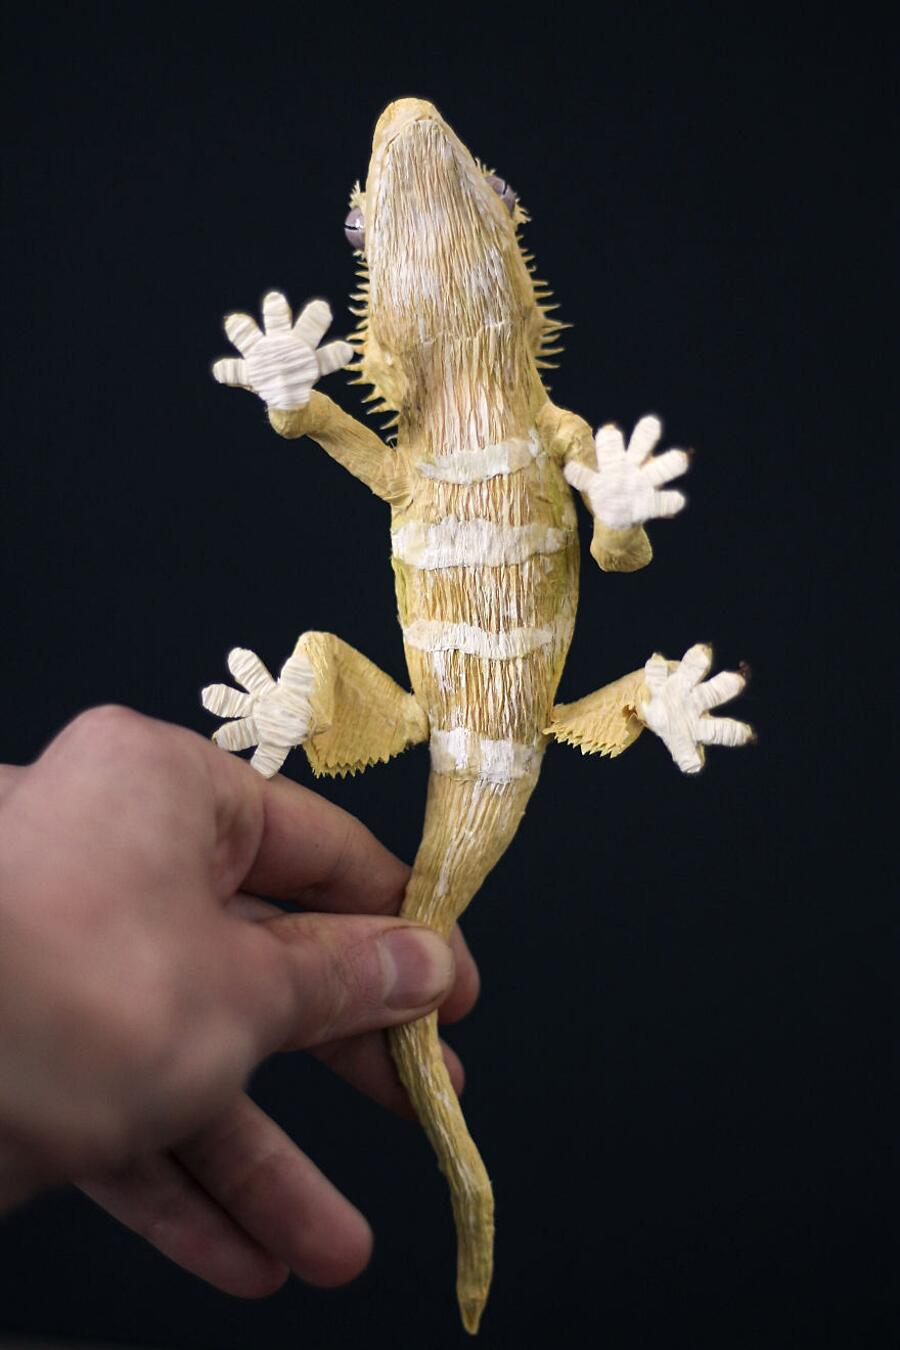 Sculture di Carta Animali Insetti Piante Tina Kraus